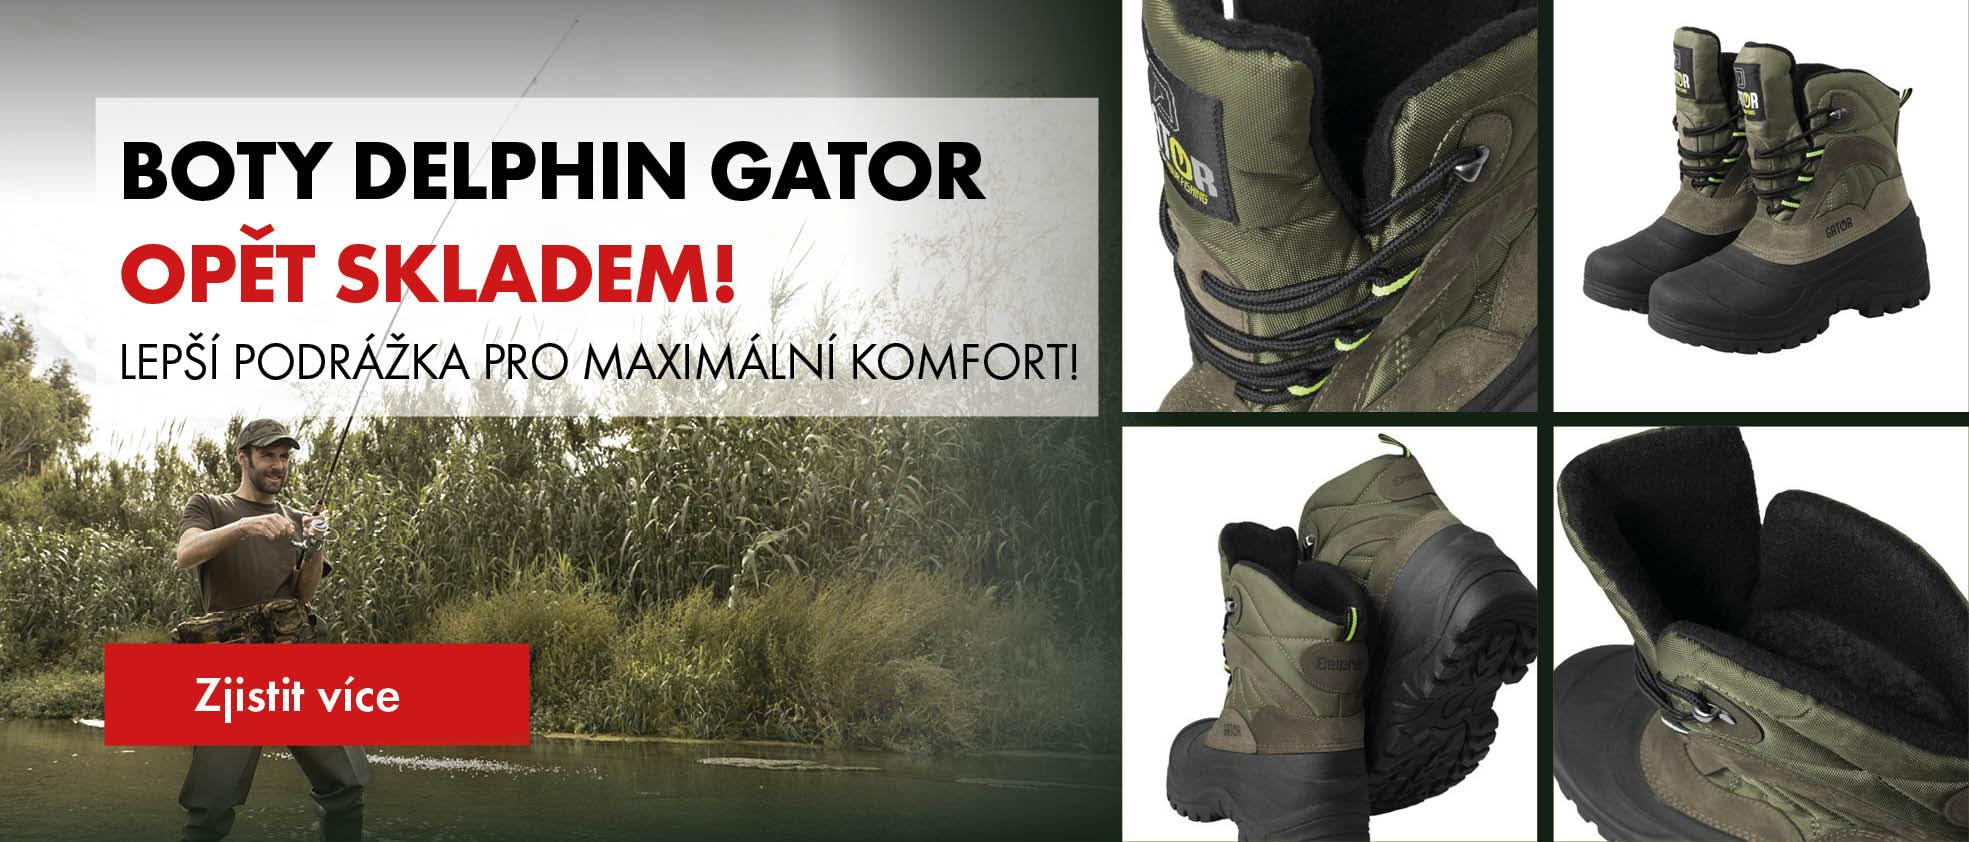 Boty Delphin Gator opět skladem!